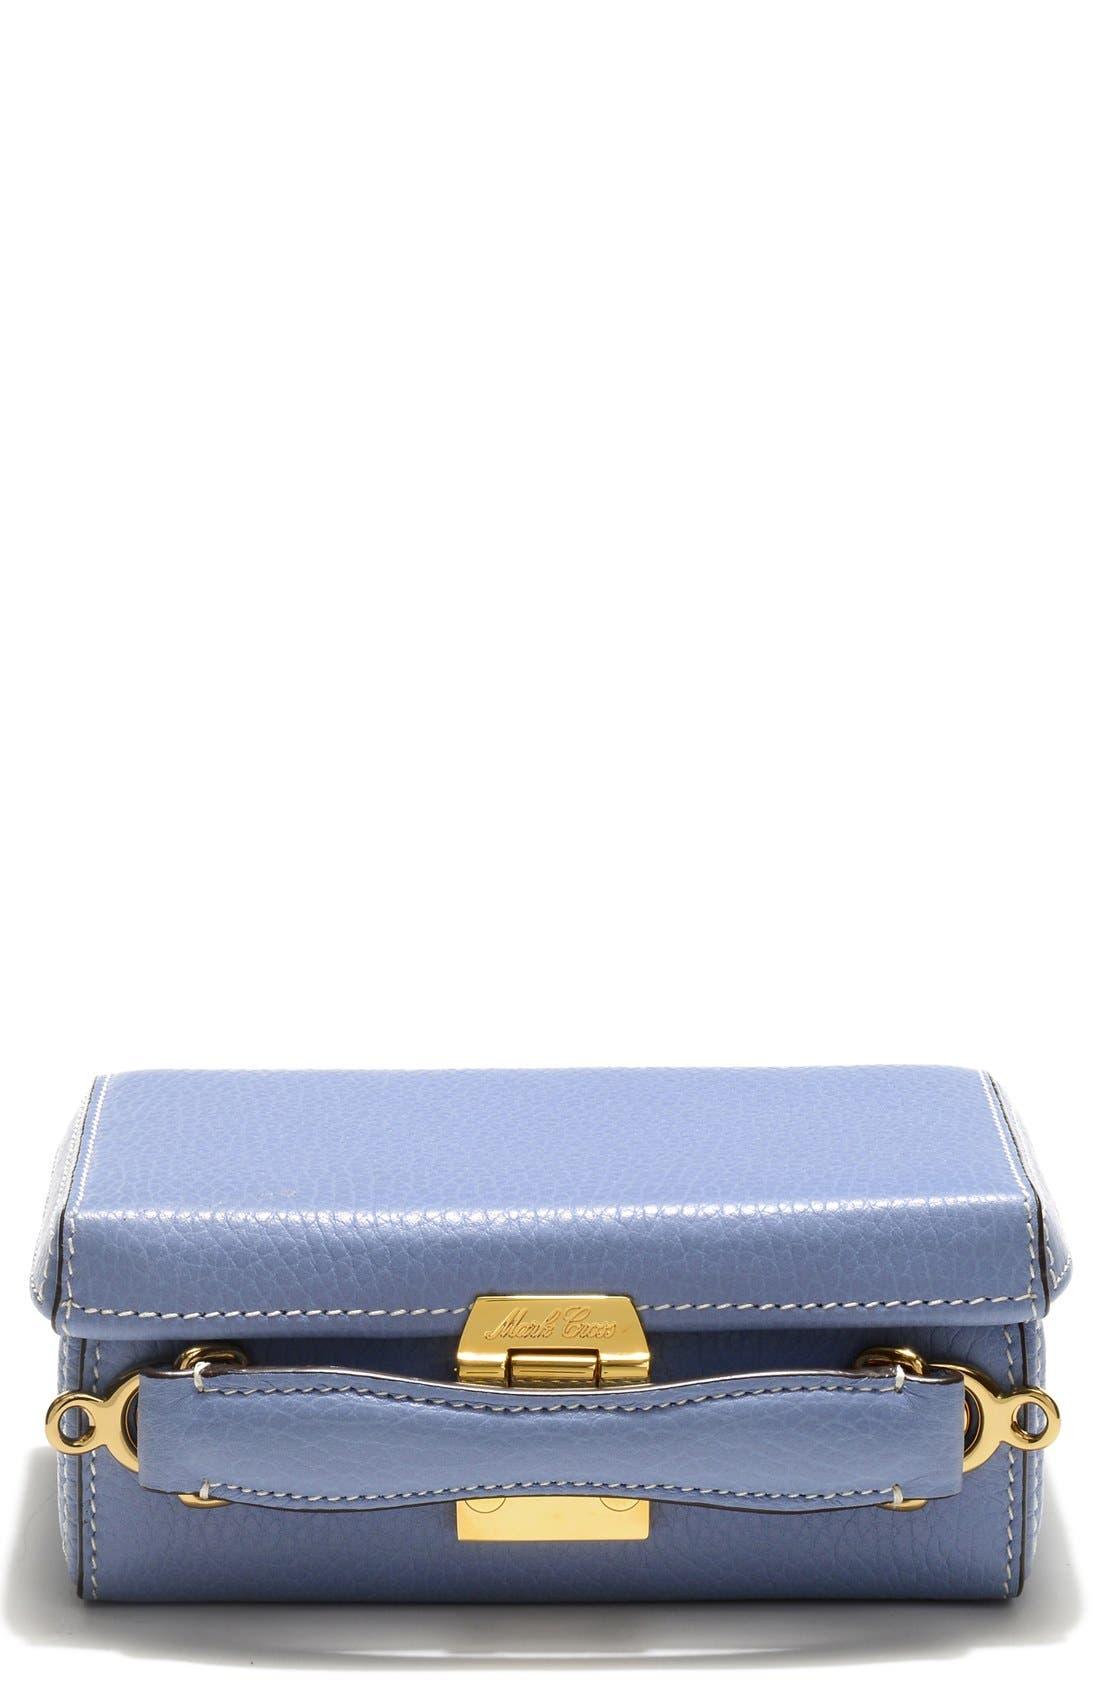 Main Image - Mark Cross 'Mini Grace' Pebbled Leather Box Bag